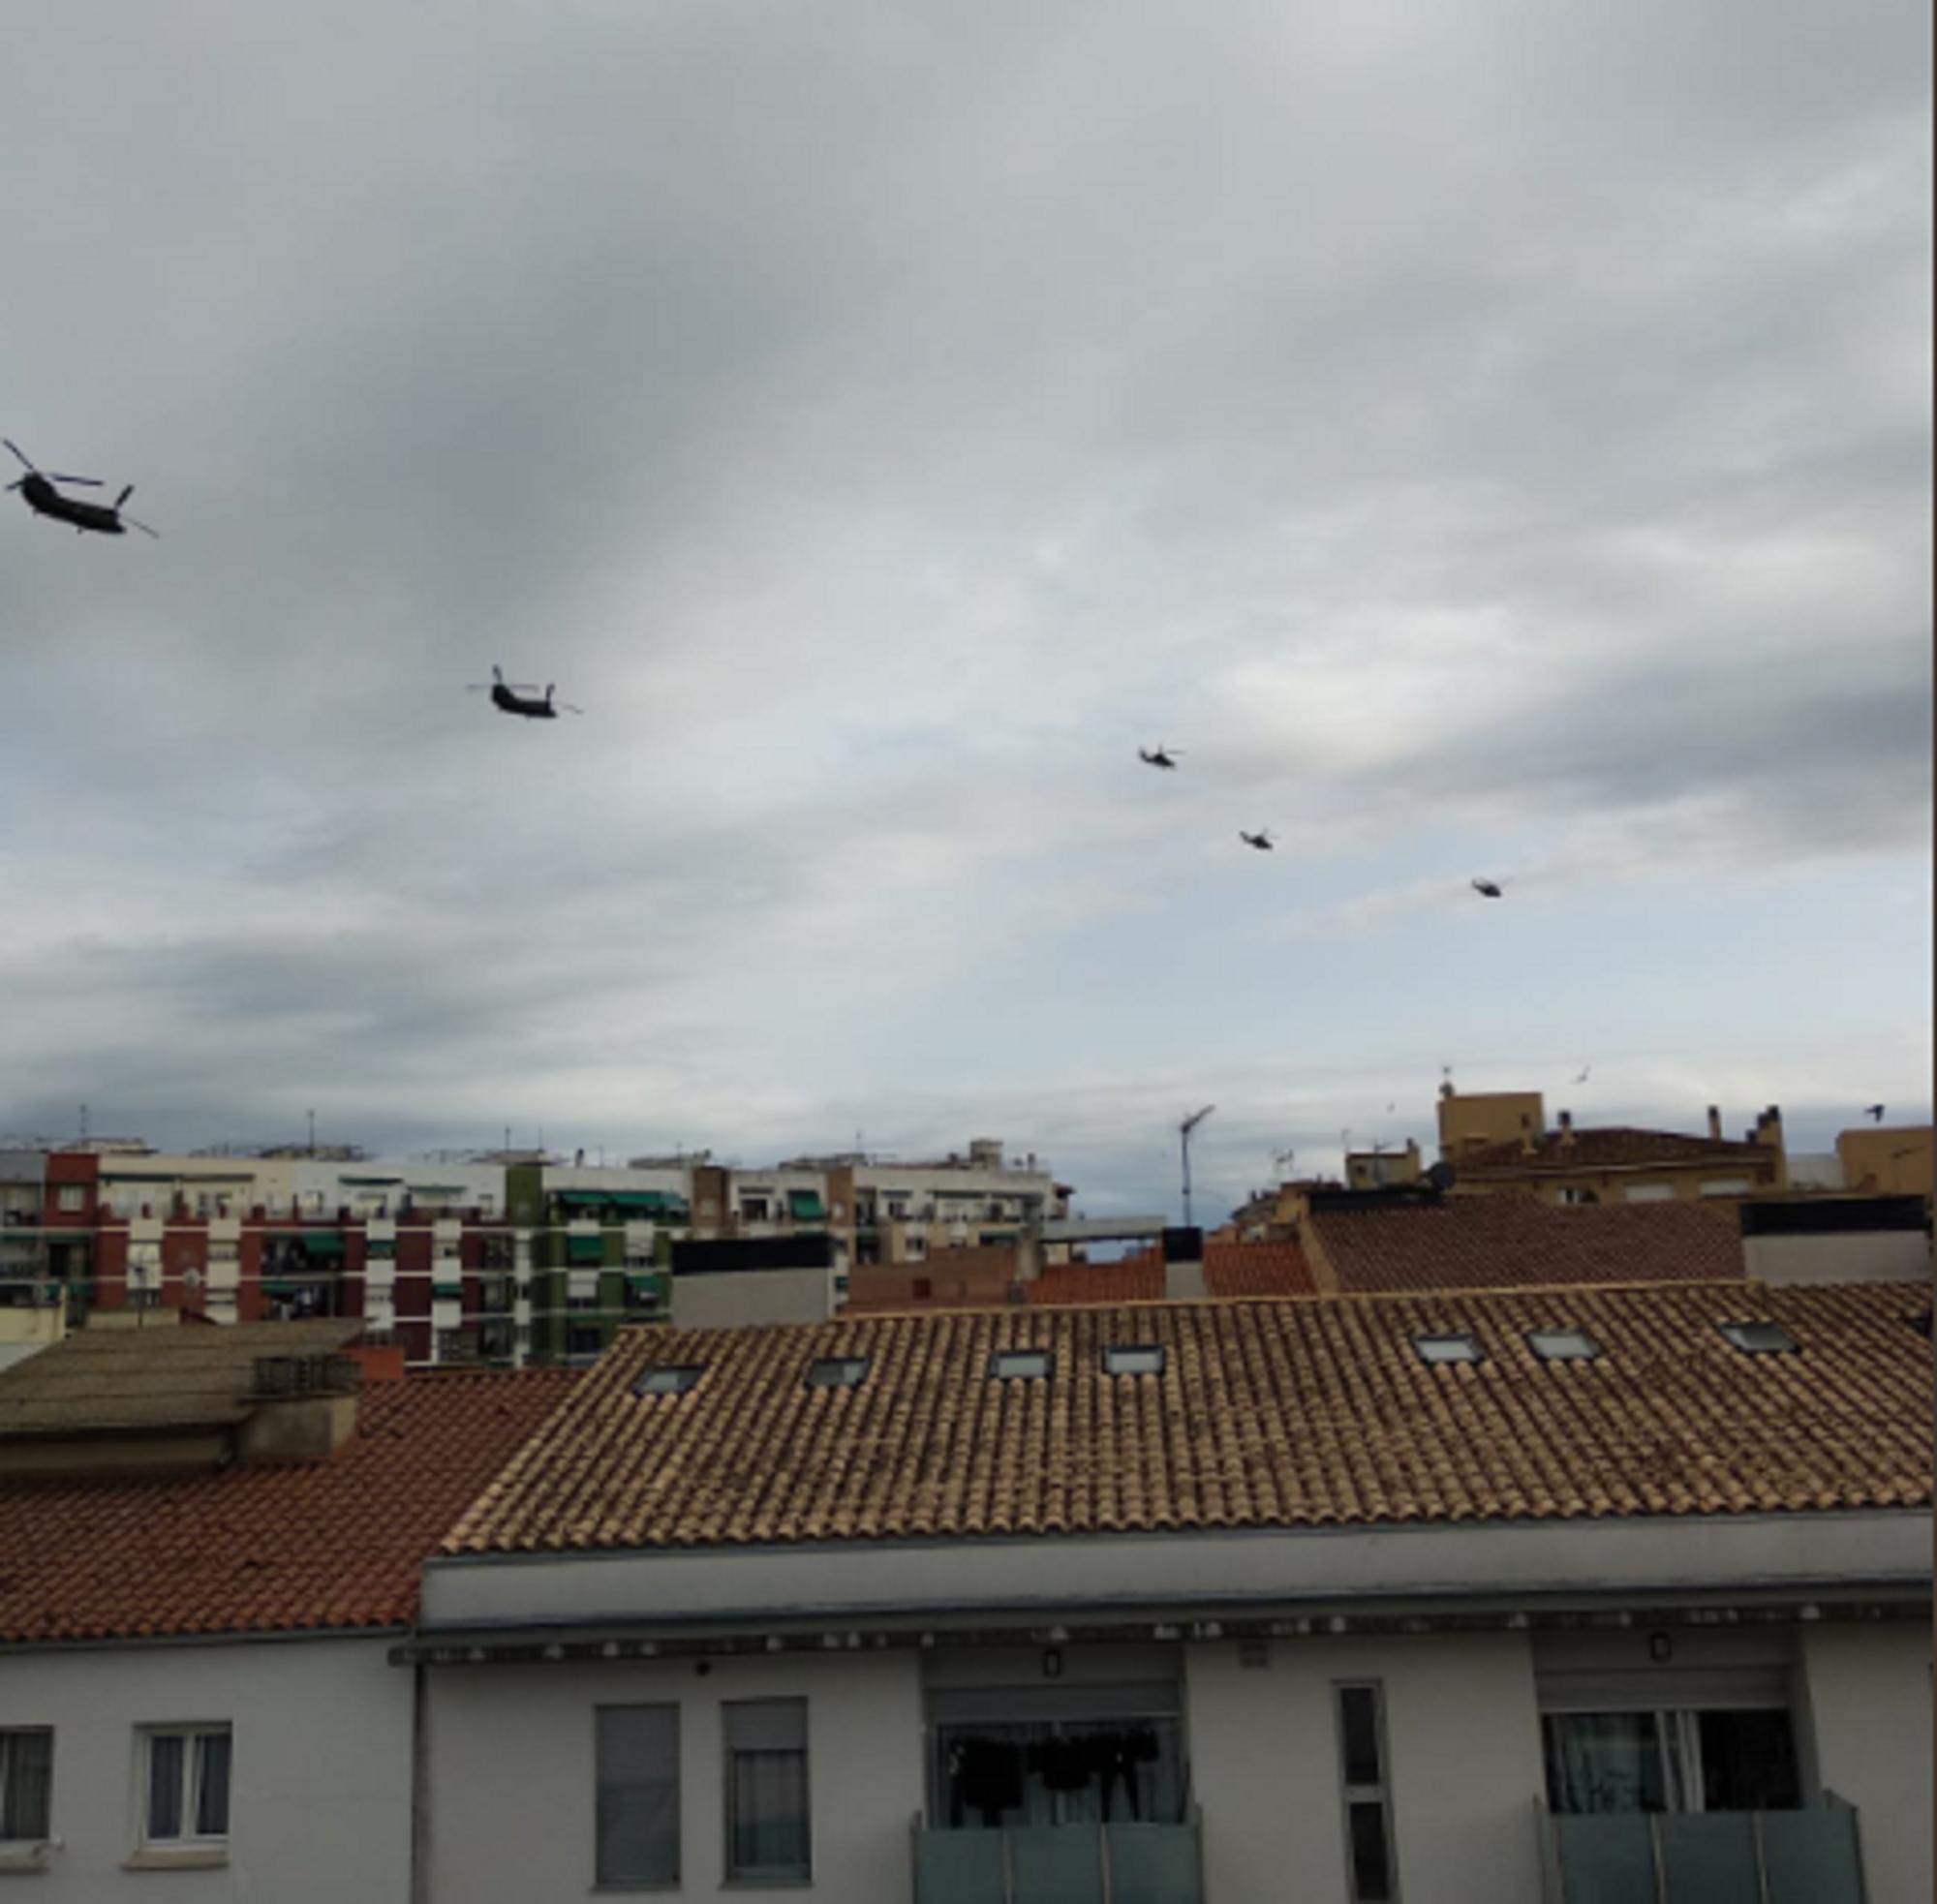 Helicopters militars girona   @OvisLupus